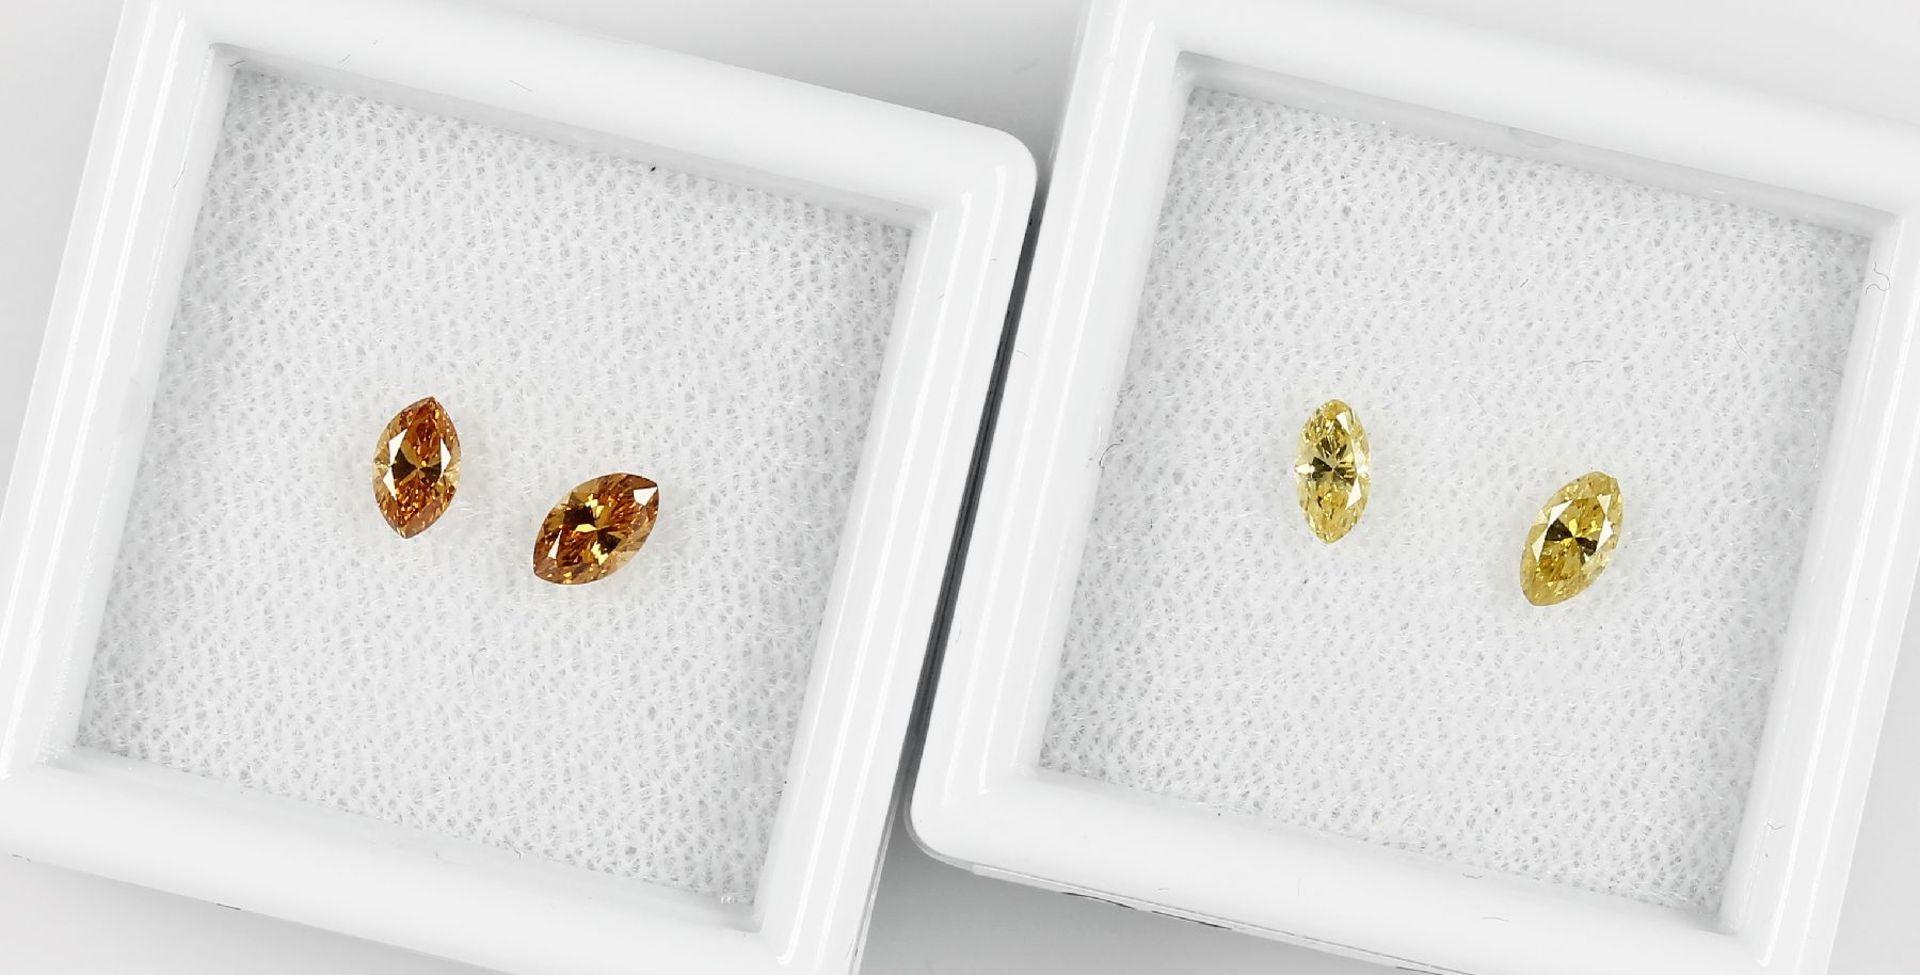 Los 70027 - Lot 2 lose Diamantpaare, best. aus: 2 x navettef. facett., zus. ca. 0.30 ct fancy yellow(beh.)/vs, 2